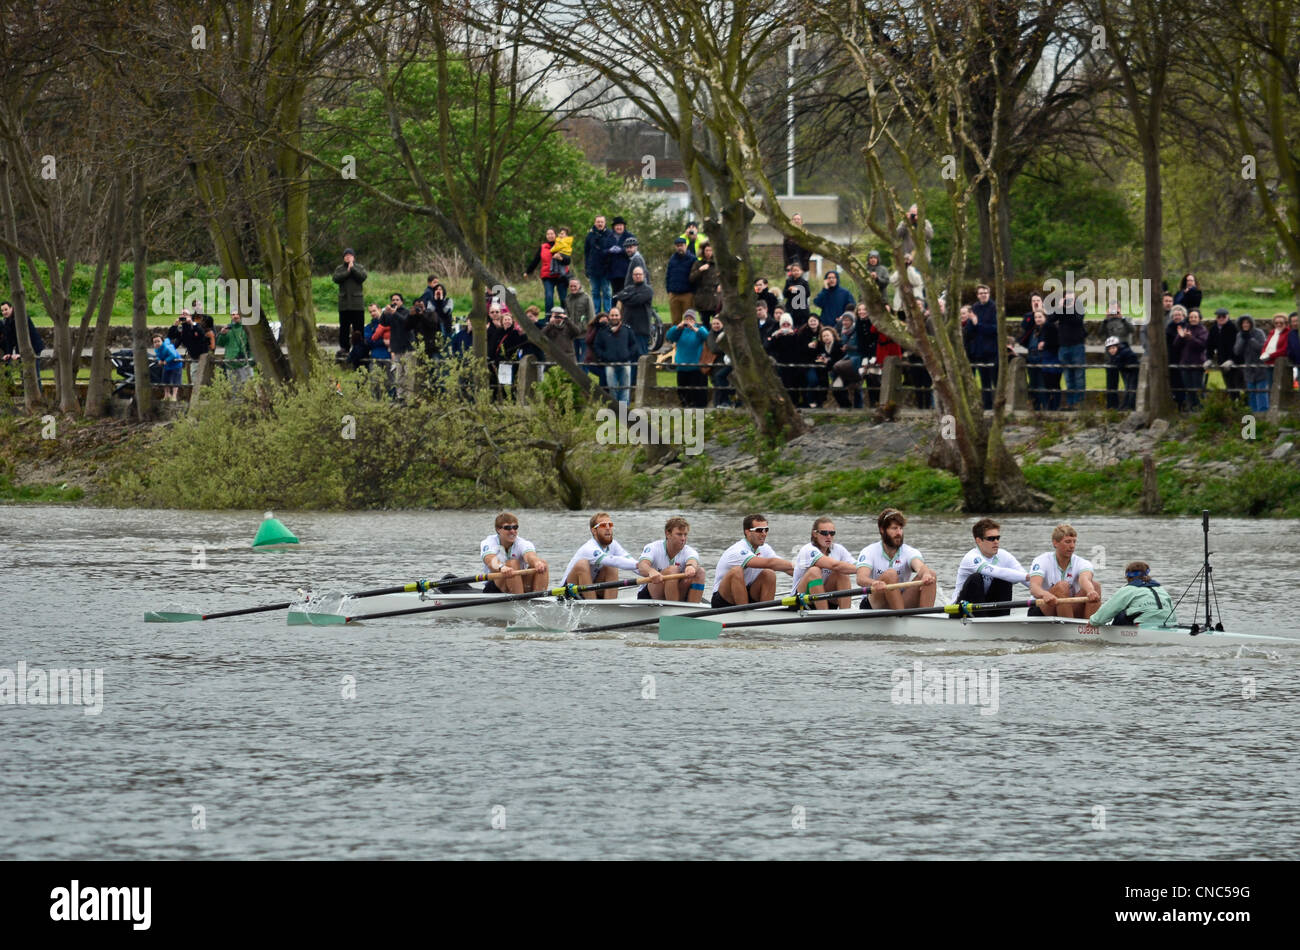 Cambridge Team - The 158th Xchanging Oxford vs Cambridge Boat Race - London 07 Apr 2012 - Stock Image